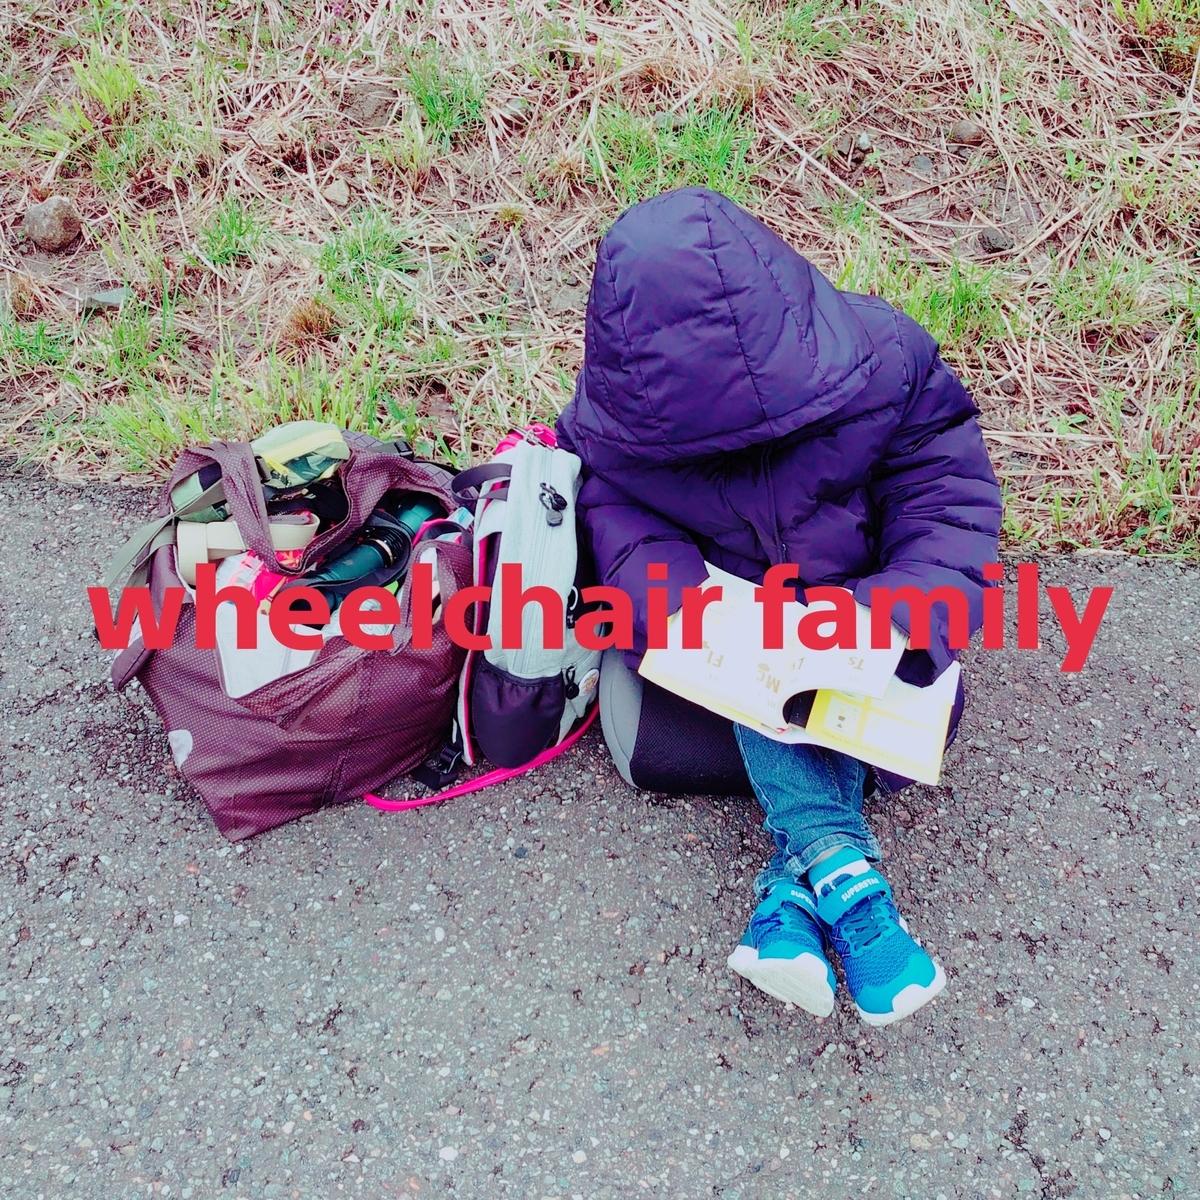 f:id:WheelchairFamily:20200504100853j:plain